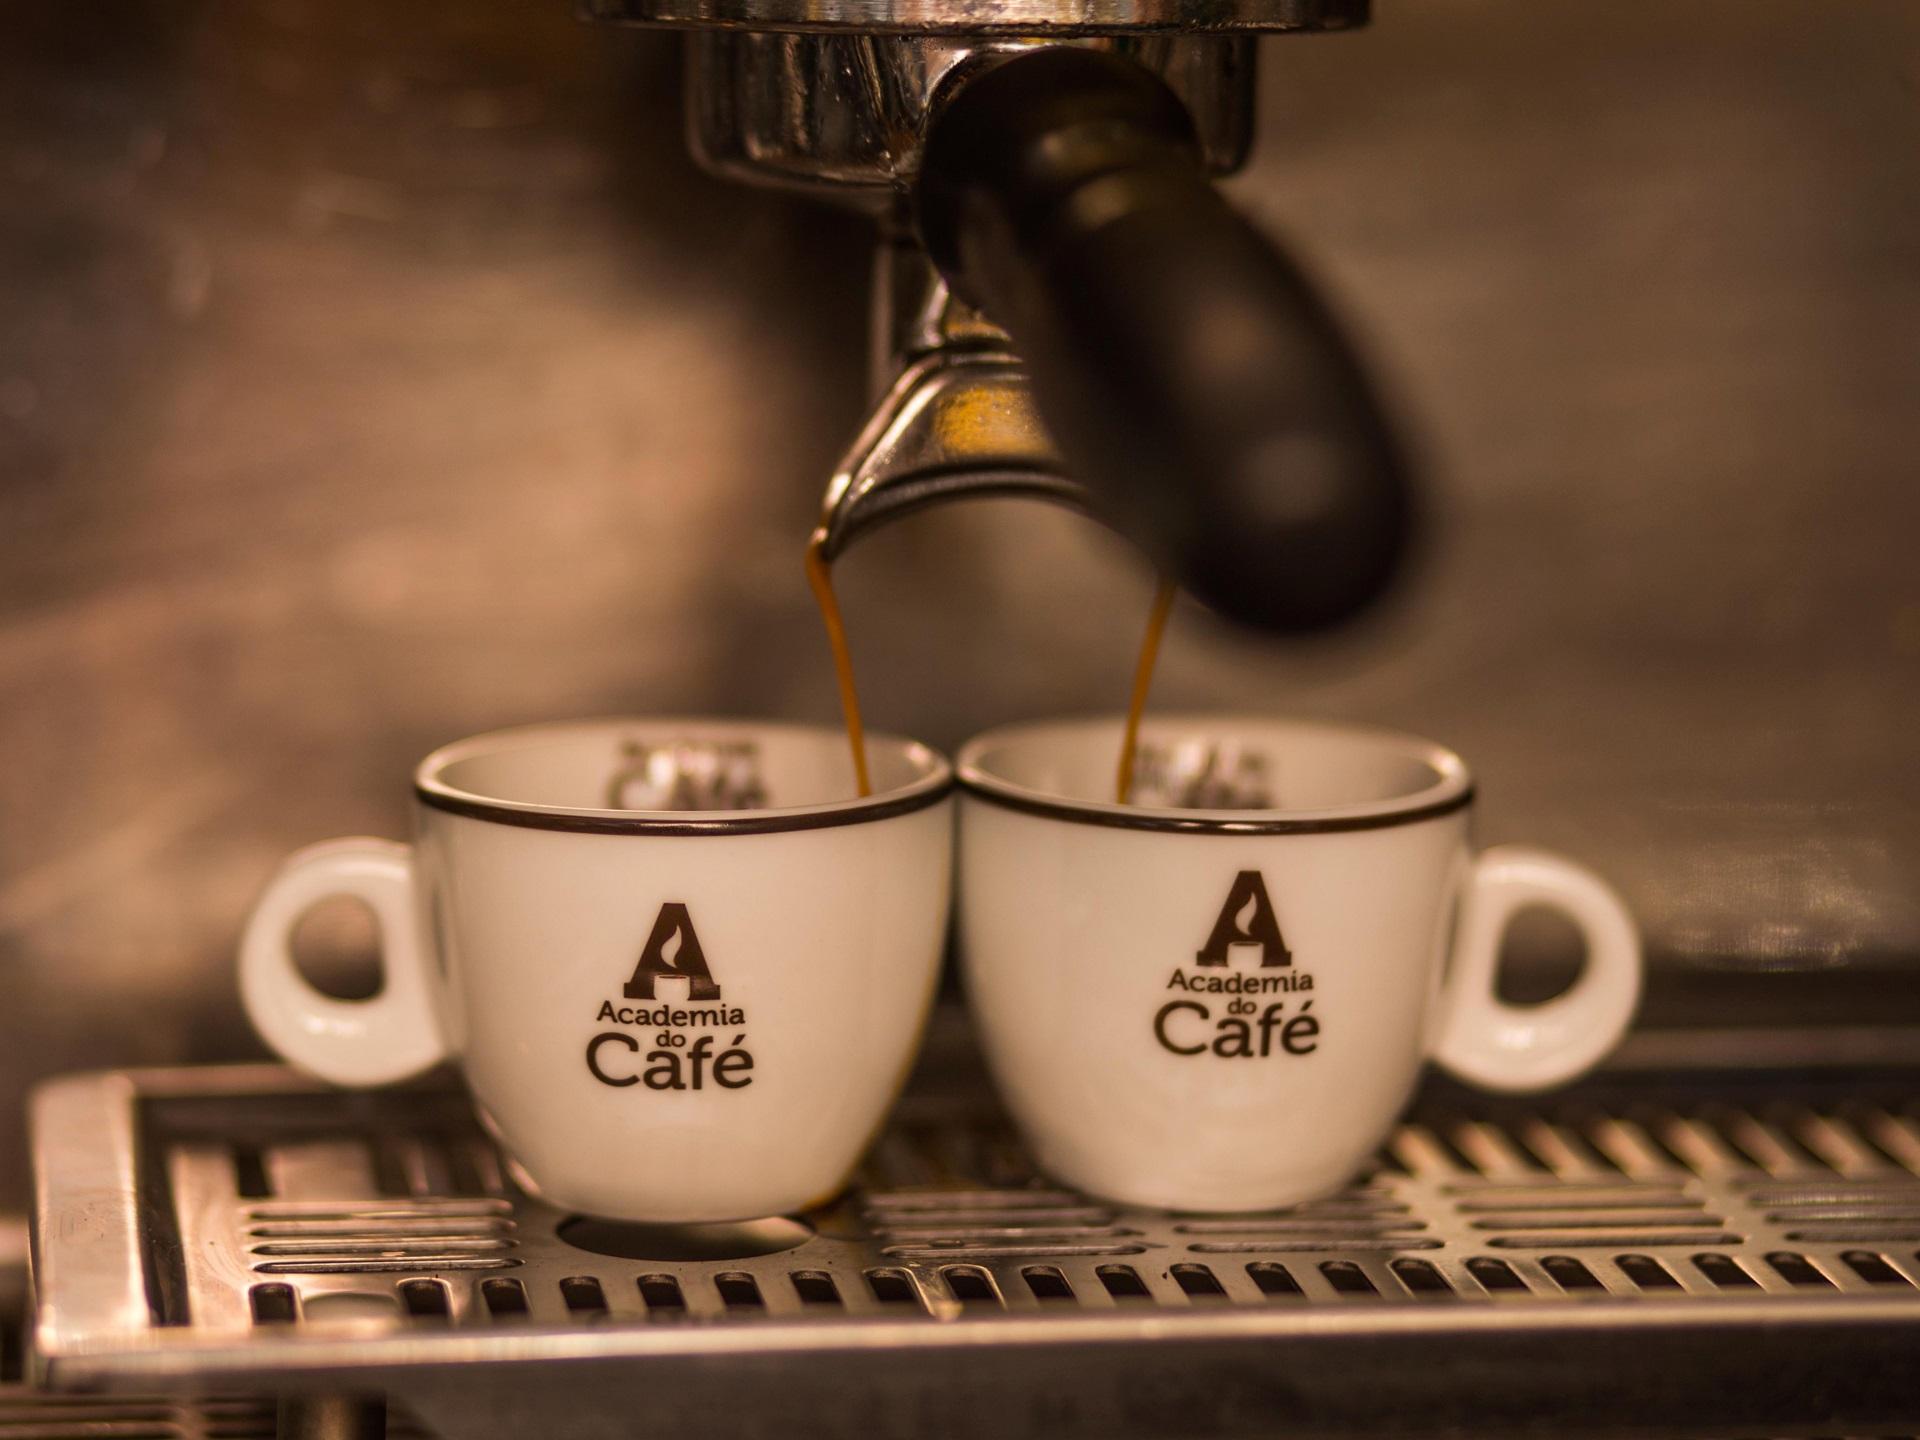 Coffee Week Brasil 2016 _Academia-do-Cafe_BeloHorizonte_Promoção 1 Espresso duplo + Pão na chapa – R$8,90